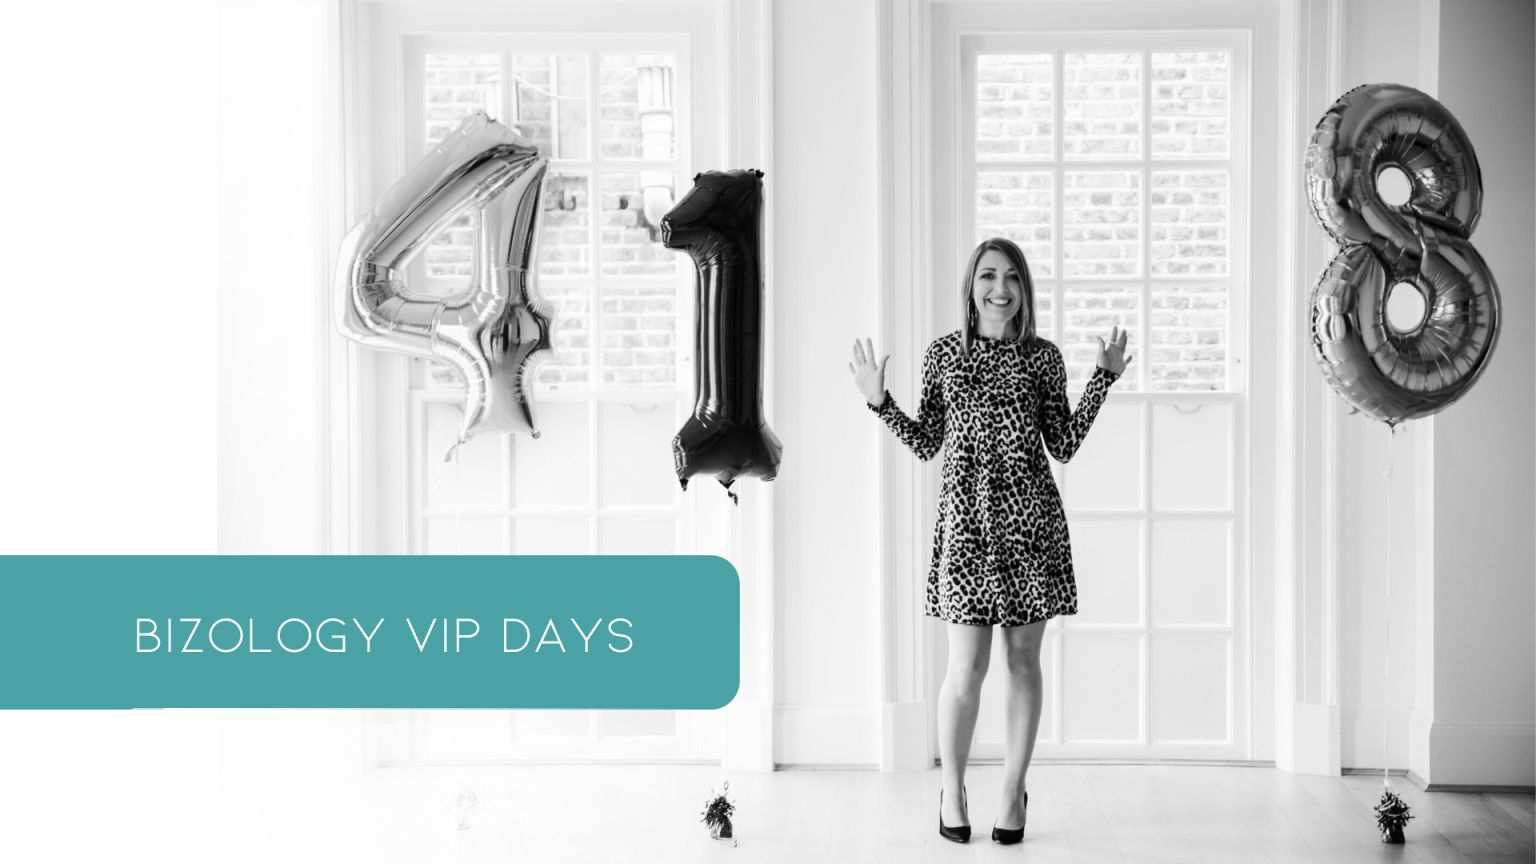 Bizology VIP Days by Jo Soley